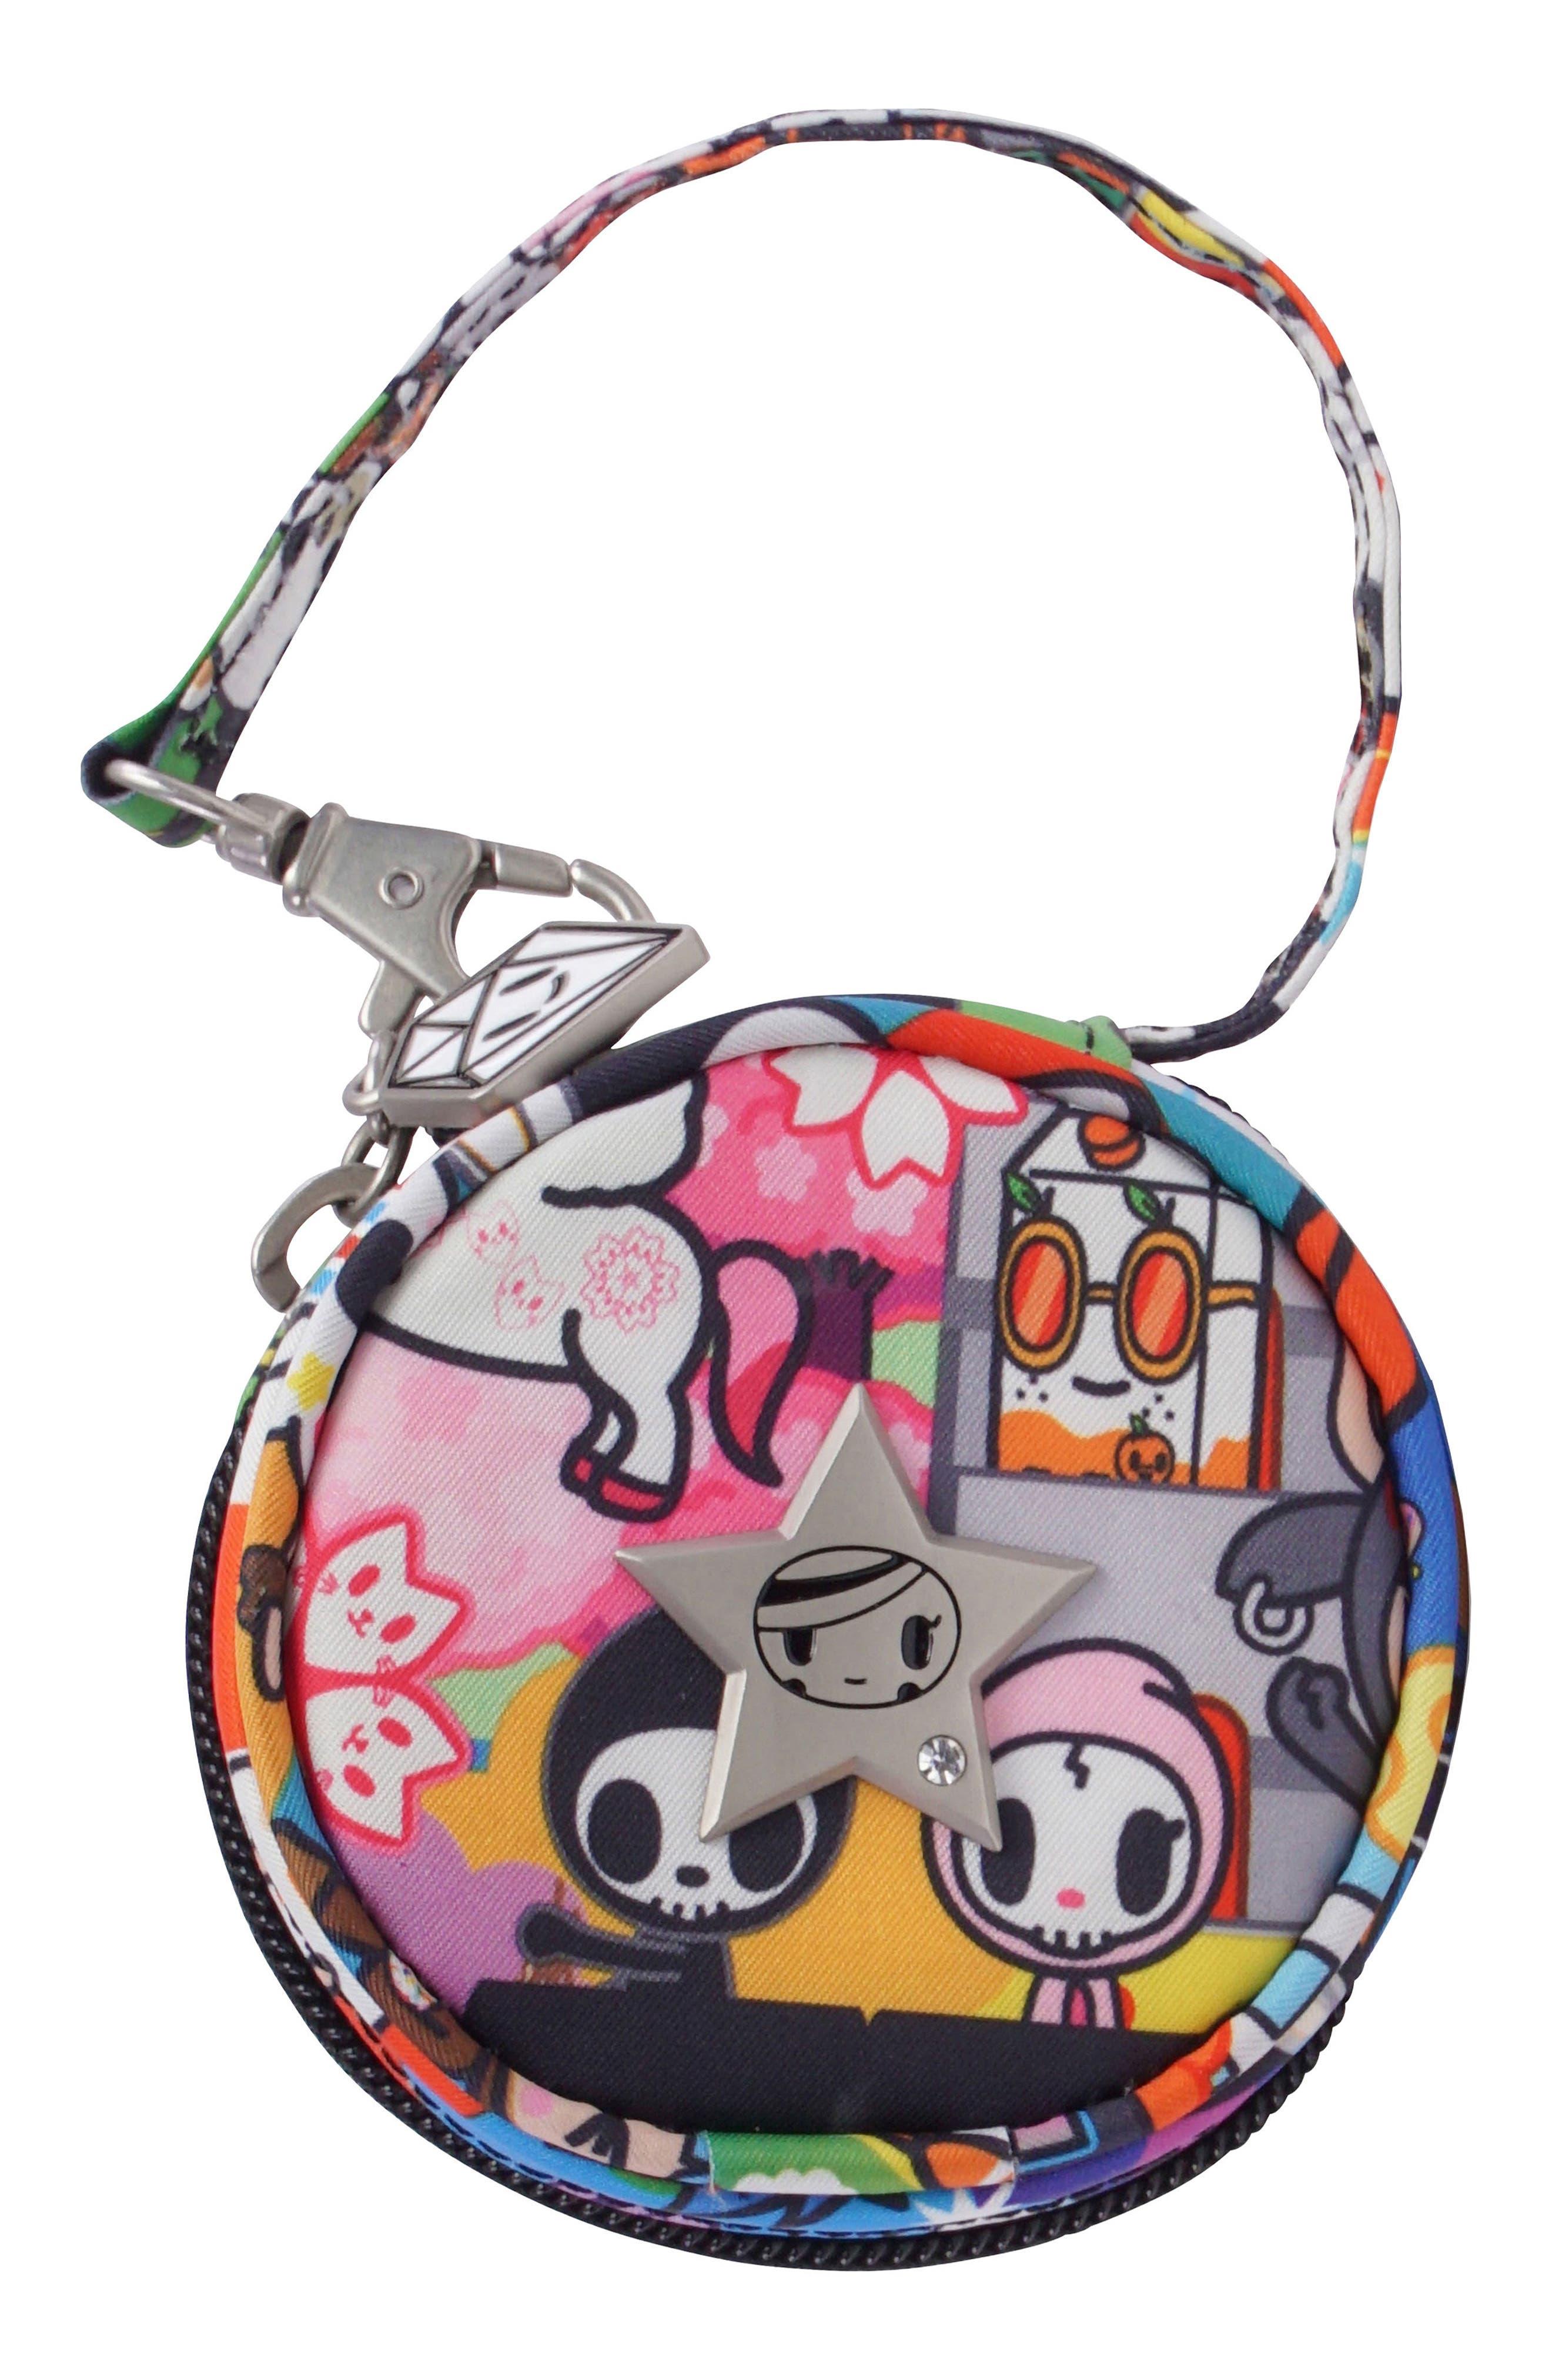 Main Image - tokidoki x Ju-Ju-Be 'Fuel Cell' Lunch Bag